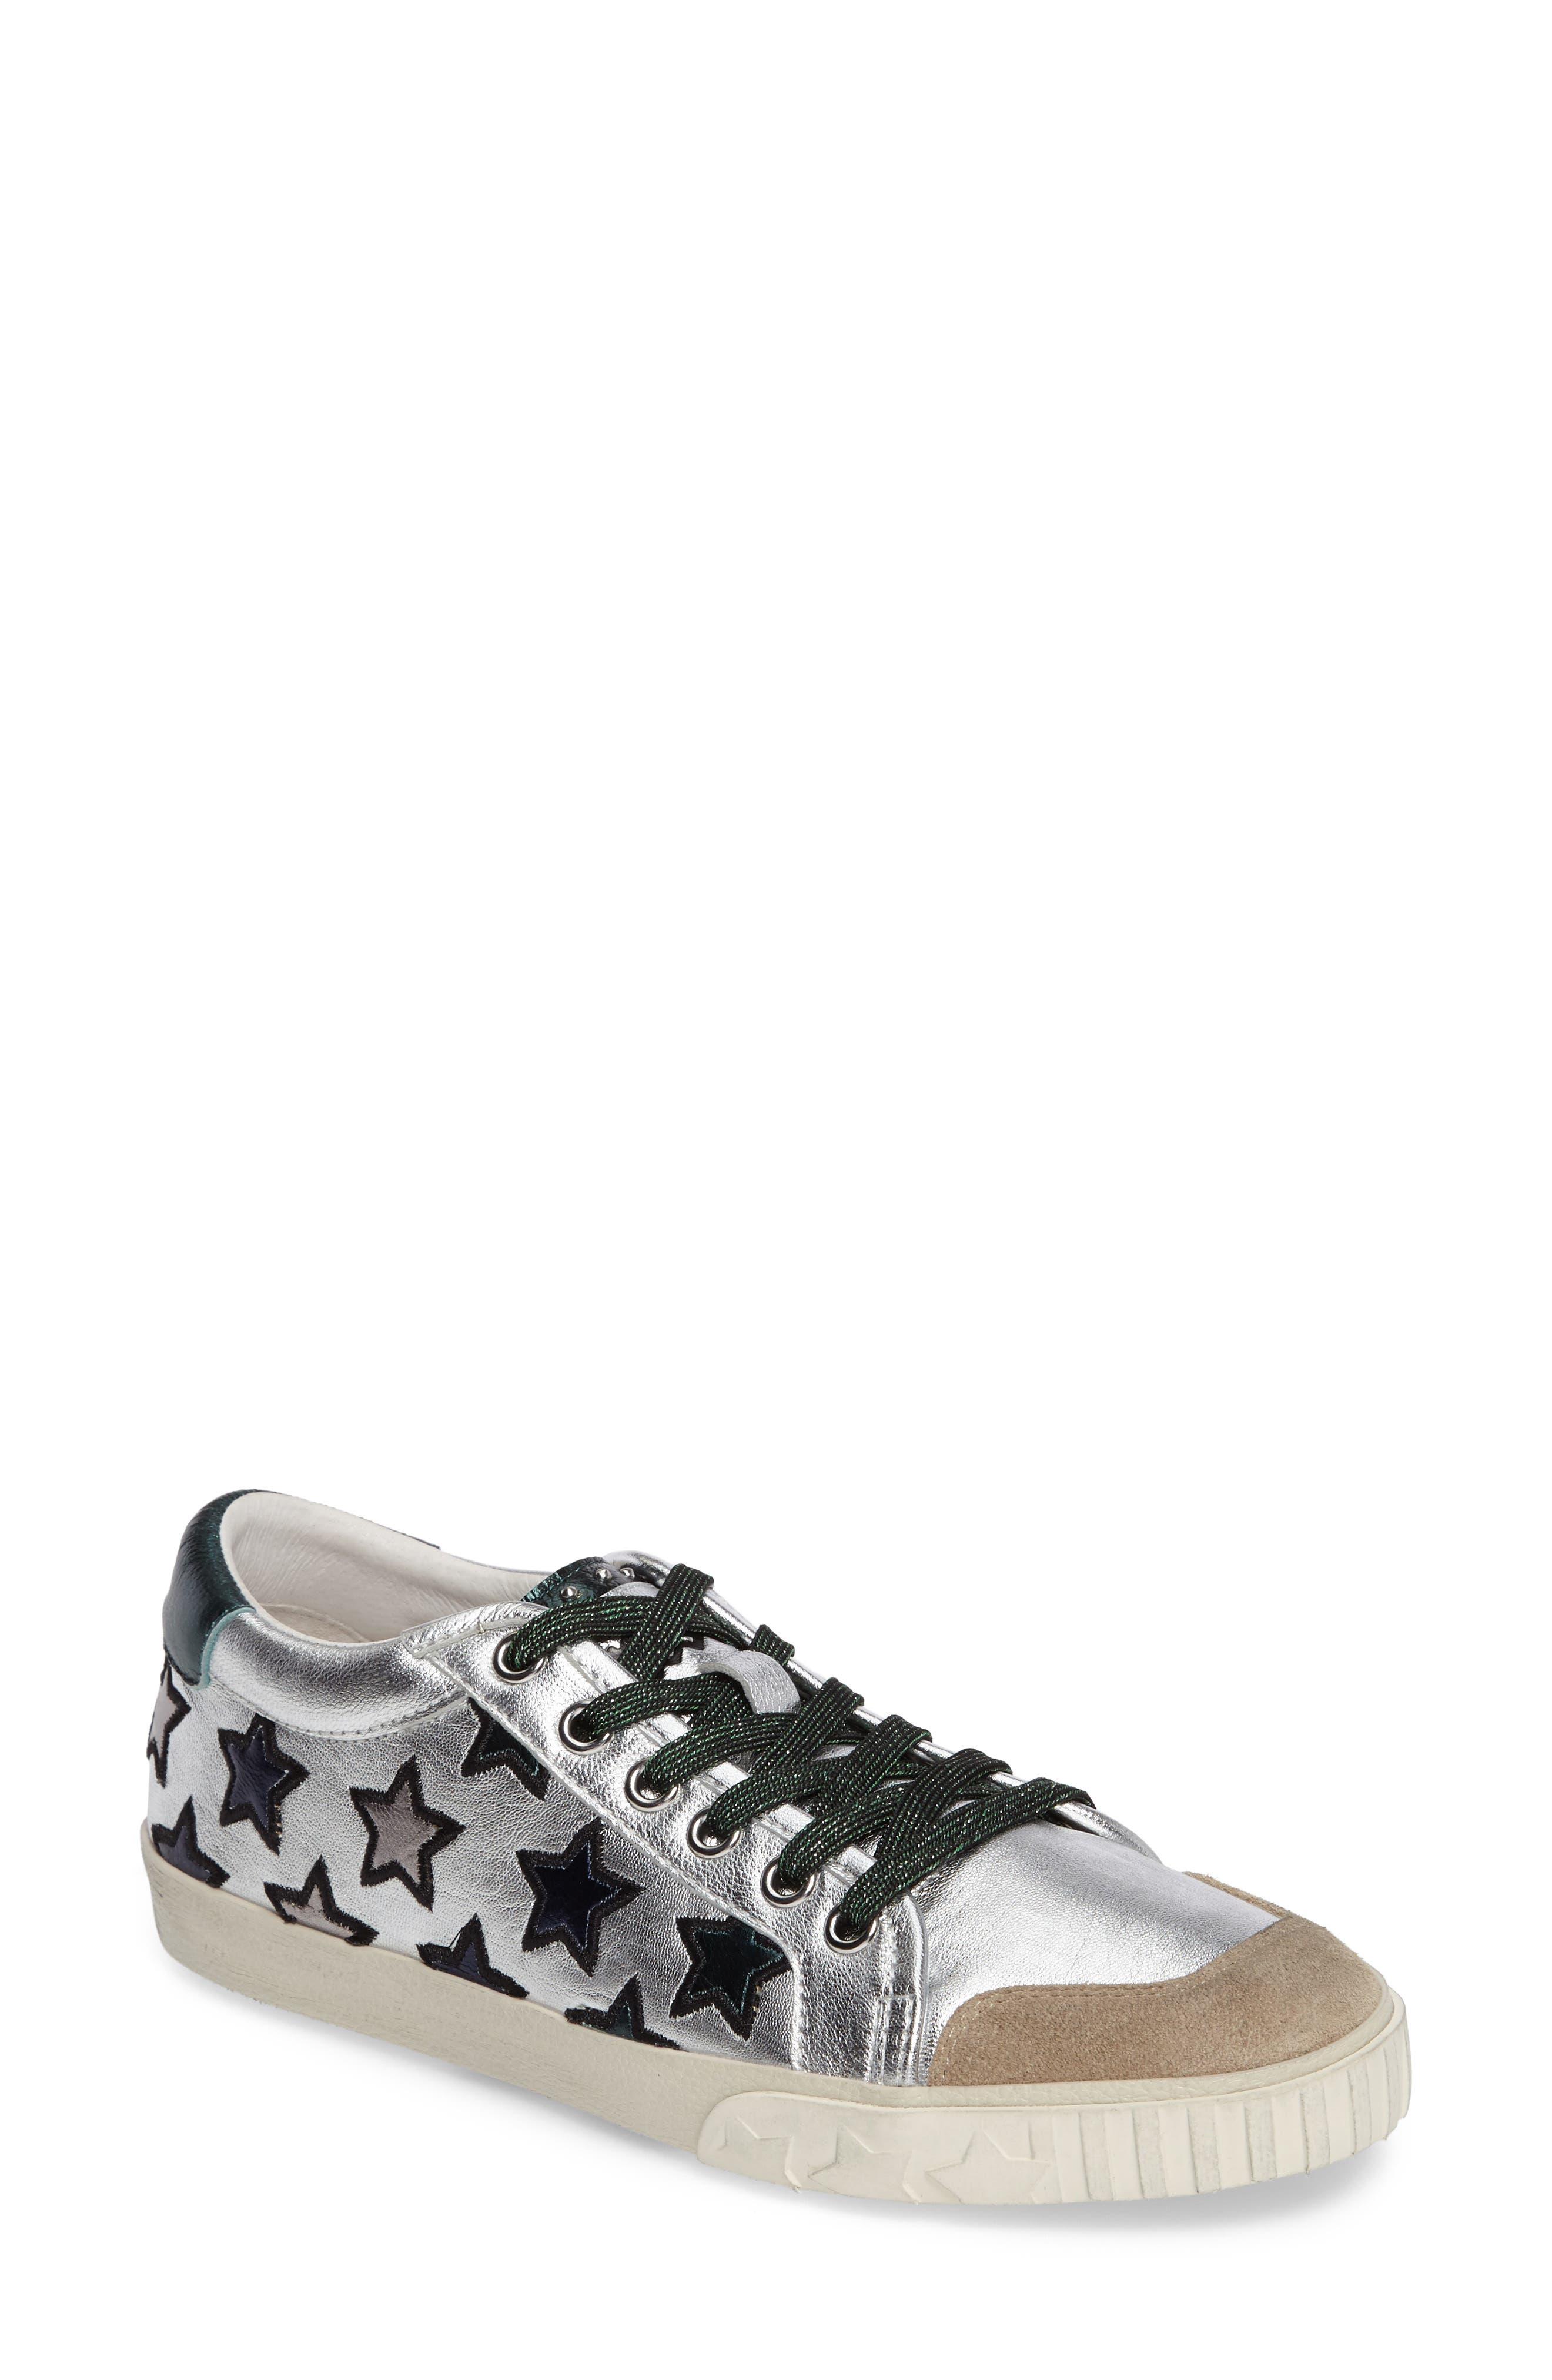 Majestic Sneaker,                             Main thumbnail 1, color,                             190